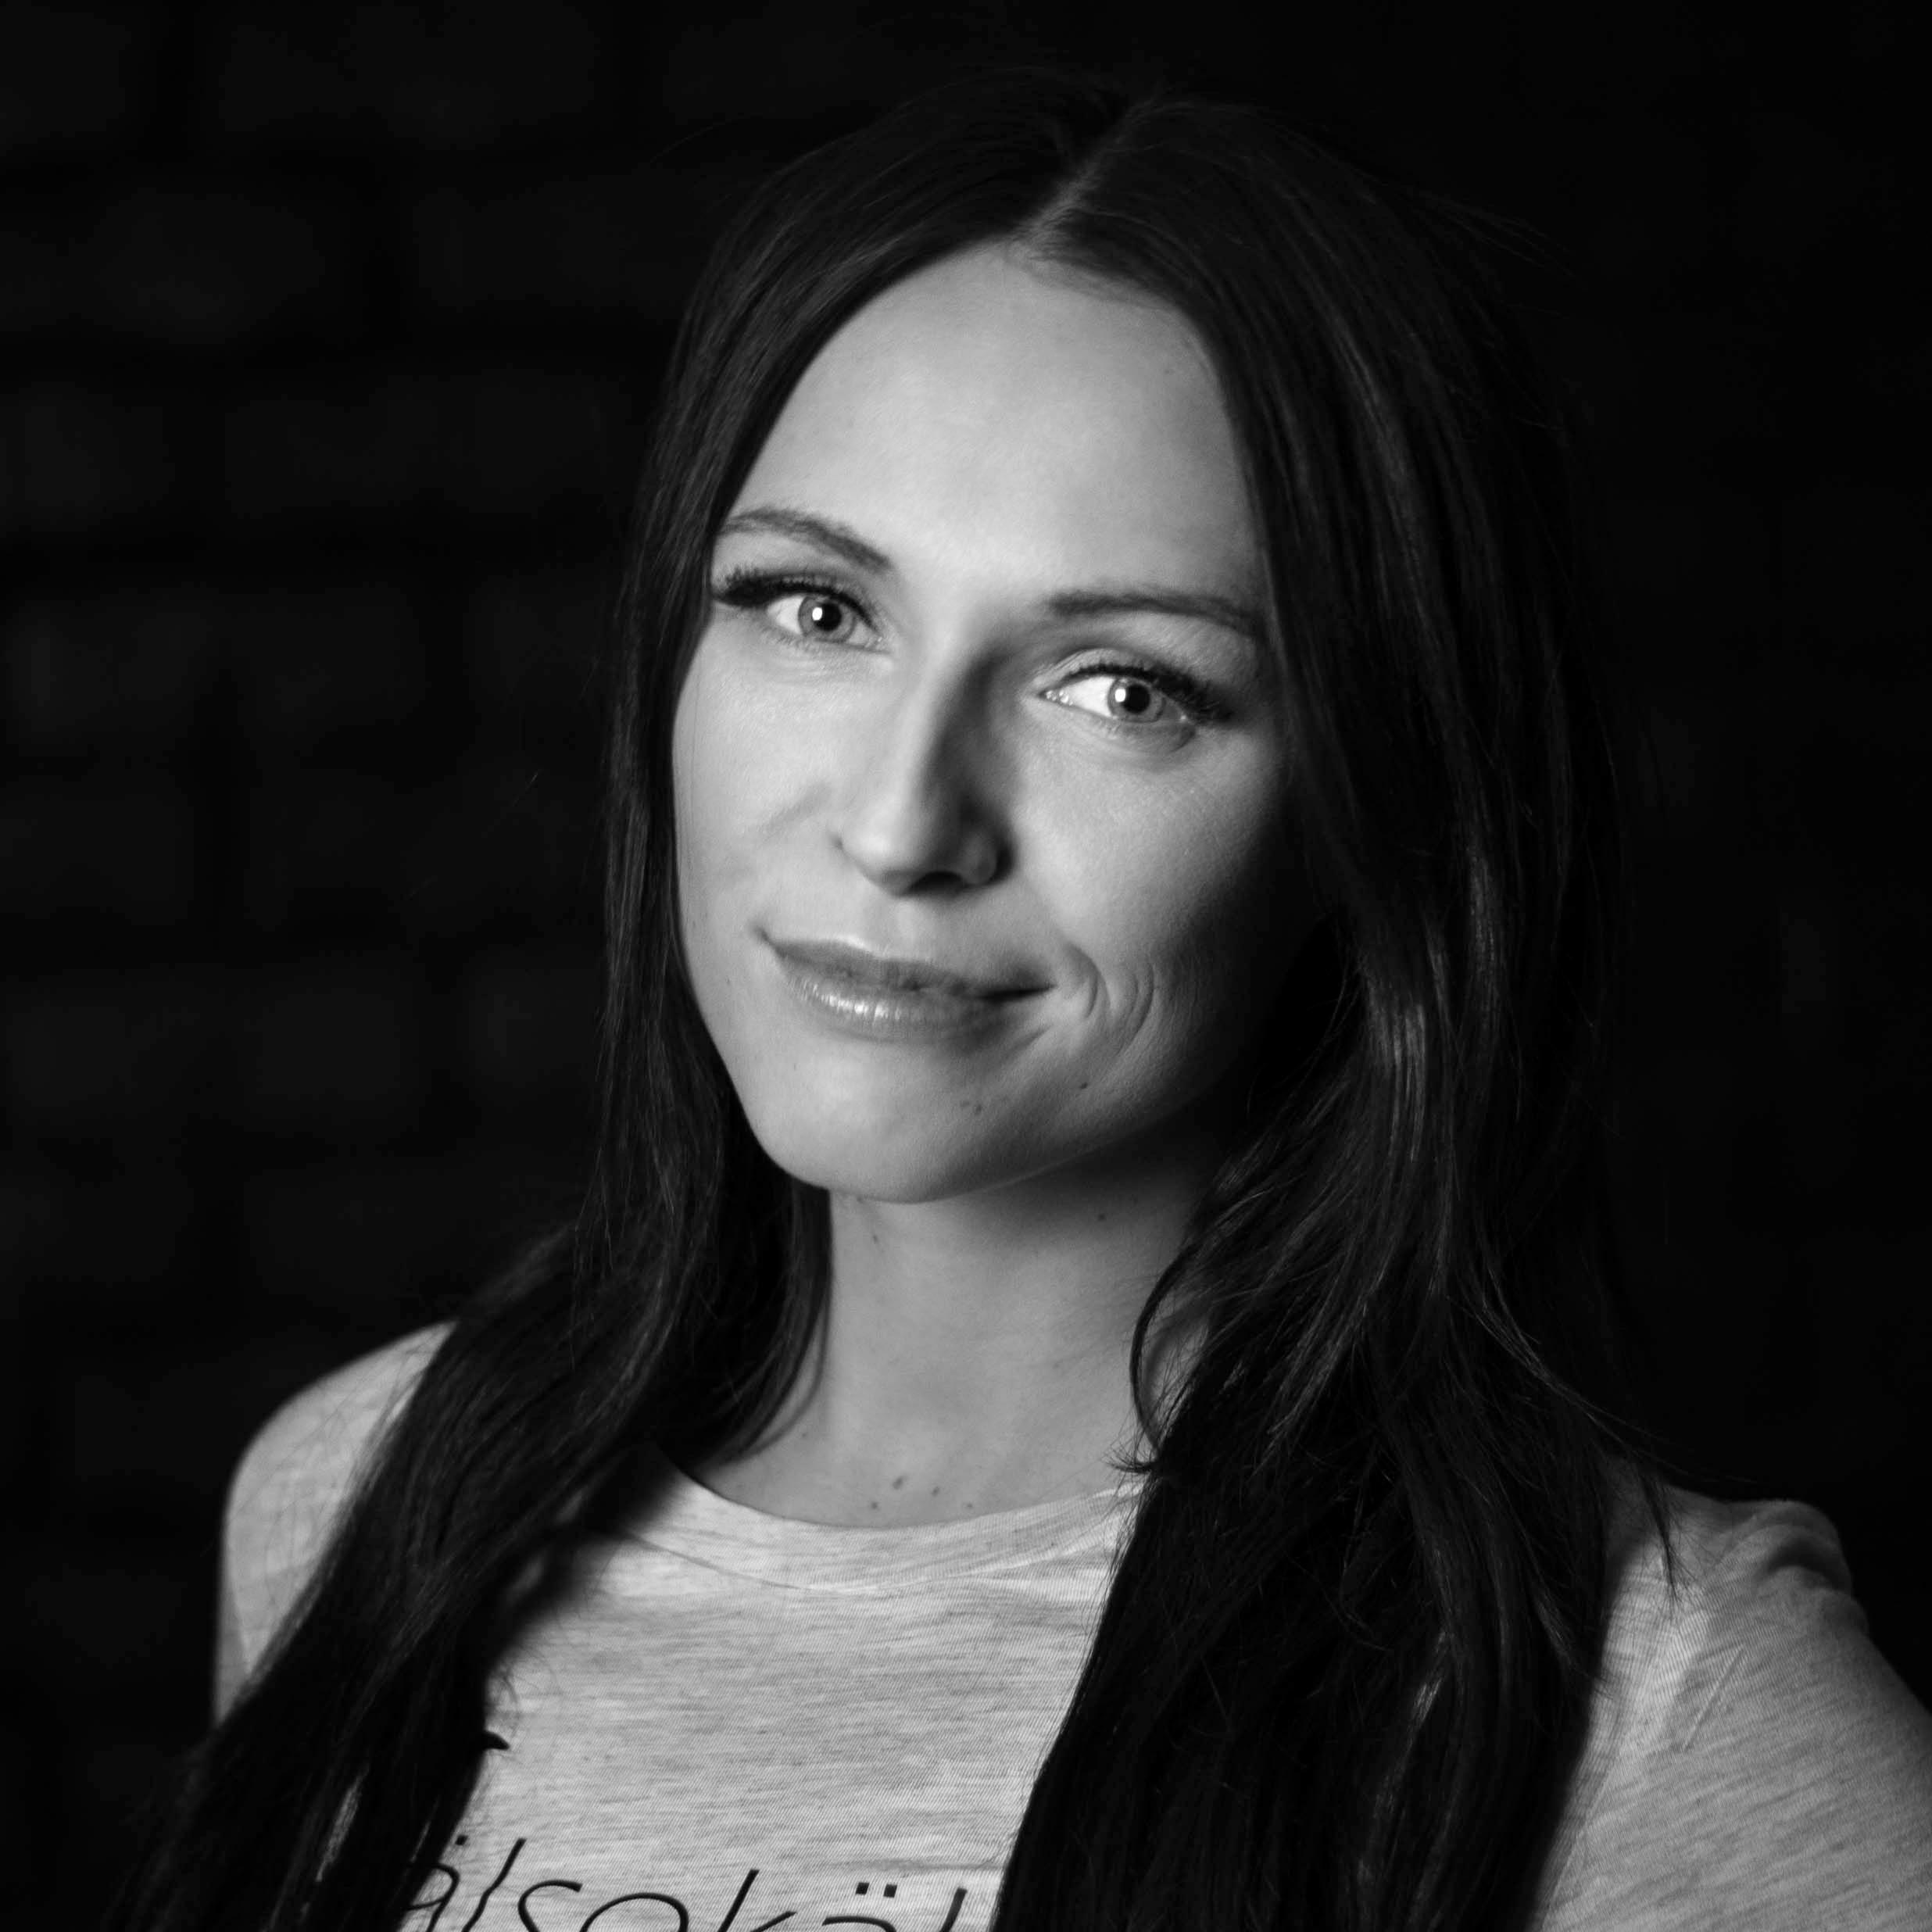 Alexandra Landheimer - alex@strongbodyfitmind.com